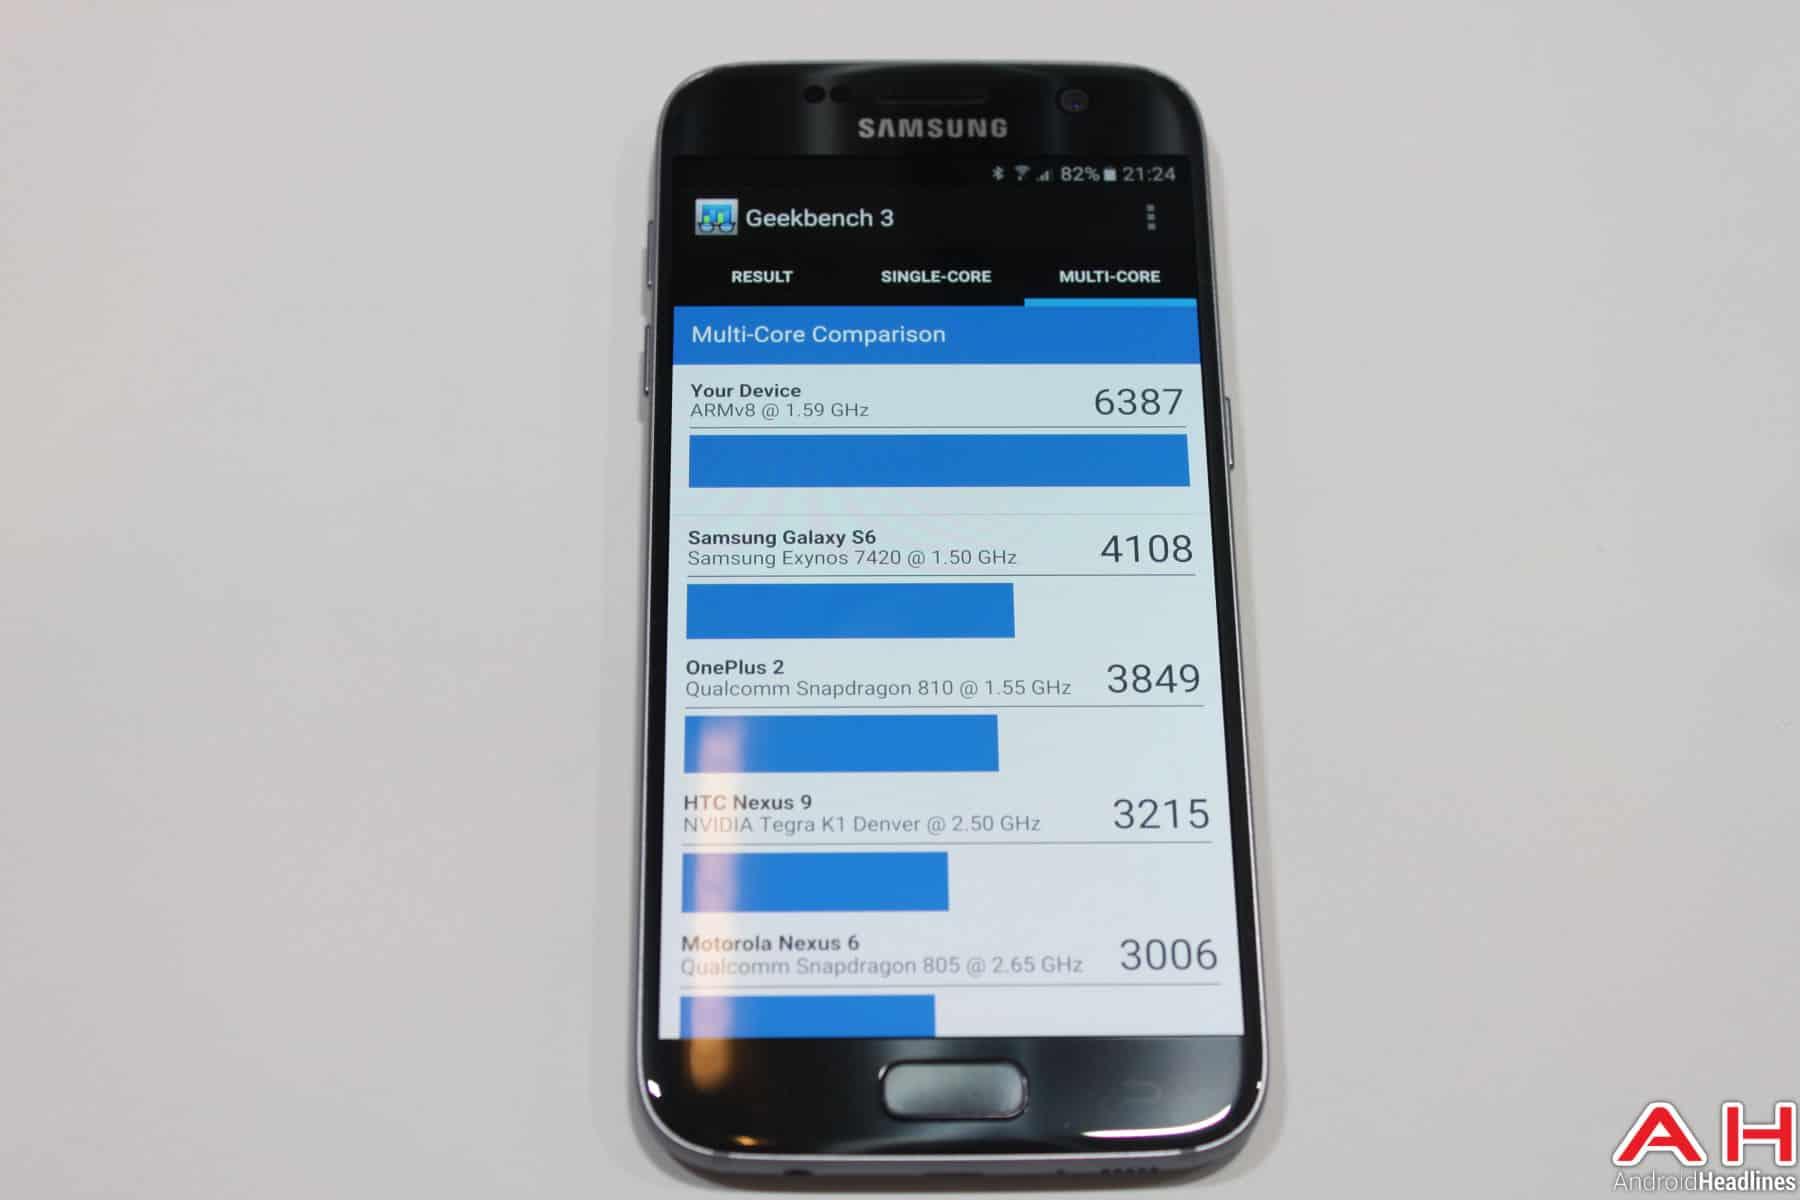 Samsung Galaxy S7 Benchmark Geekbench 3